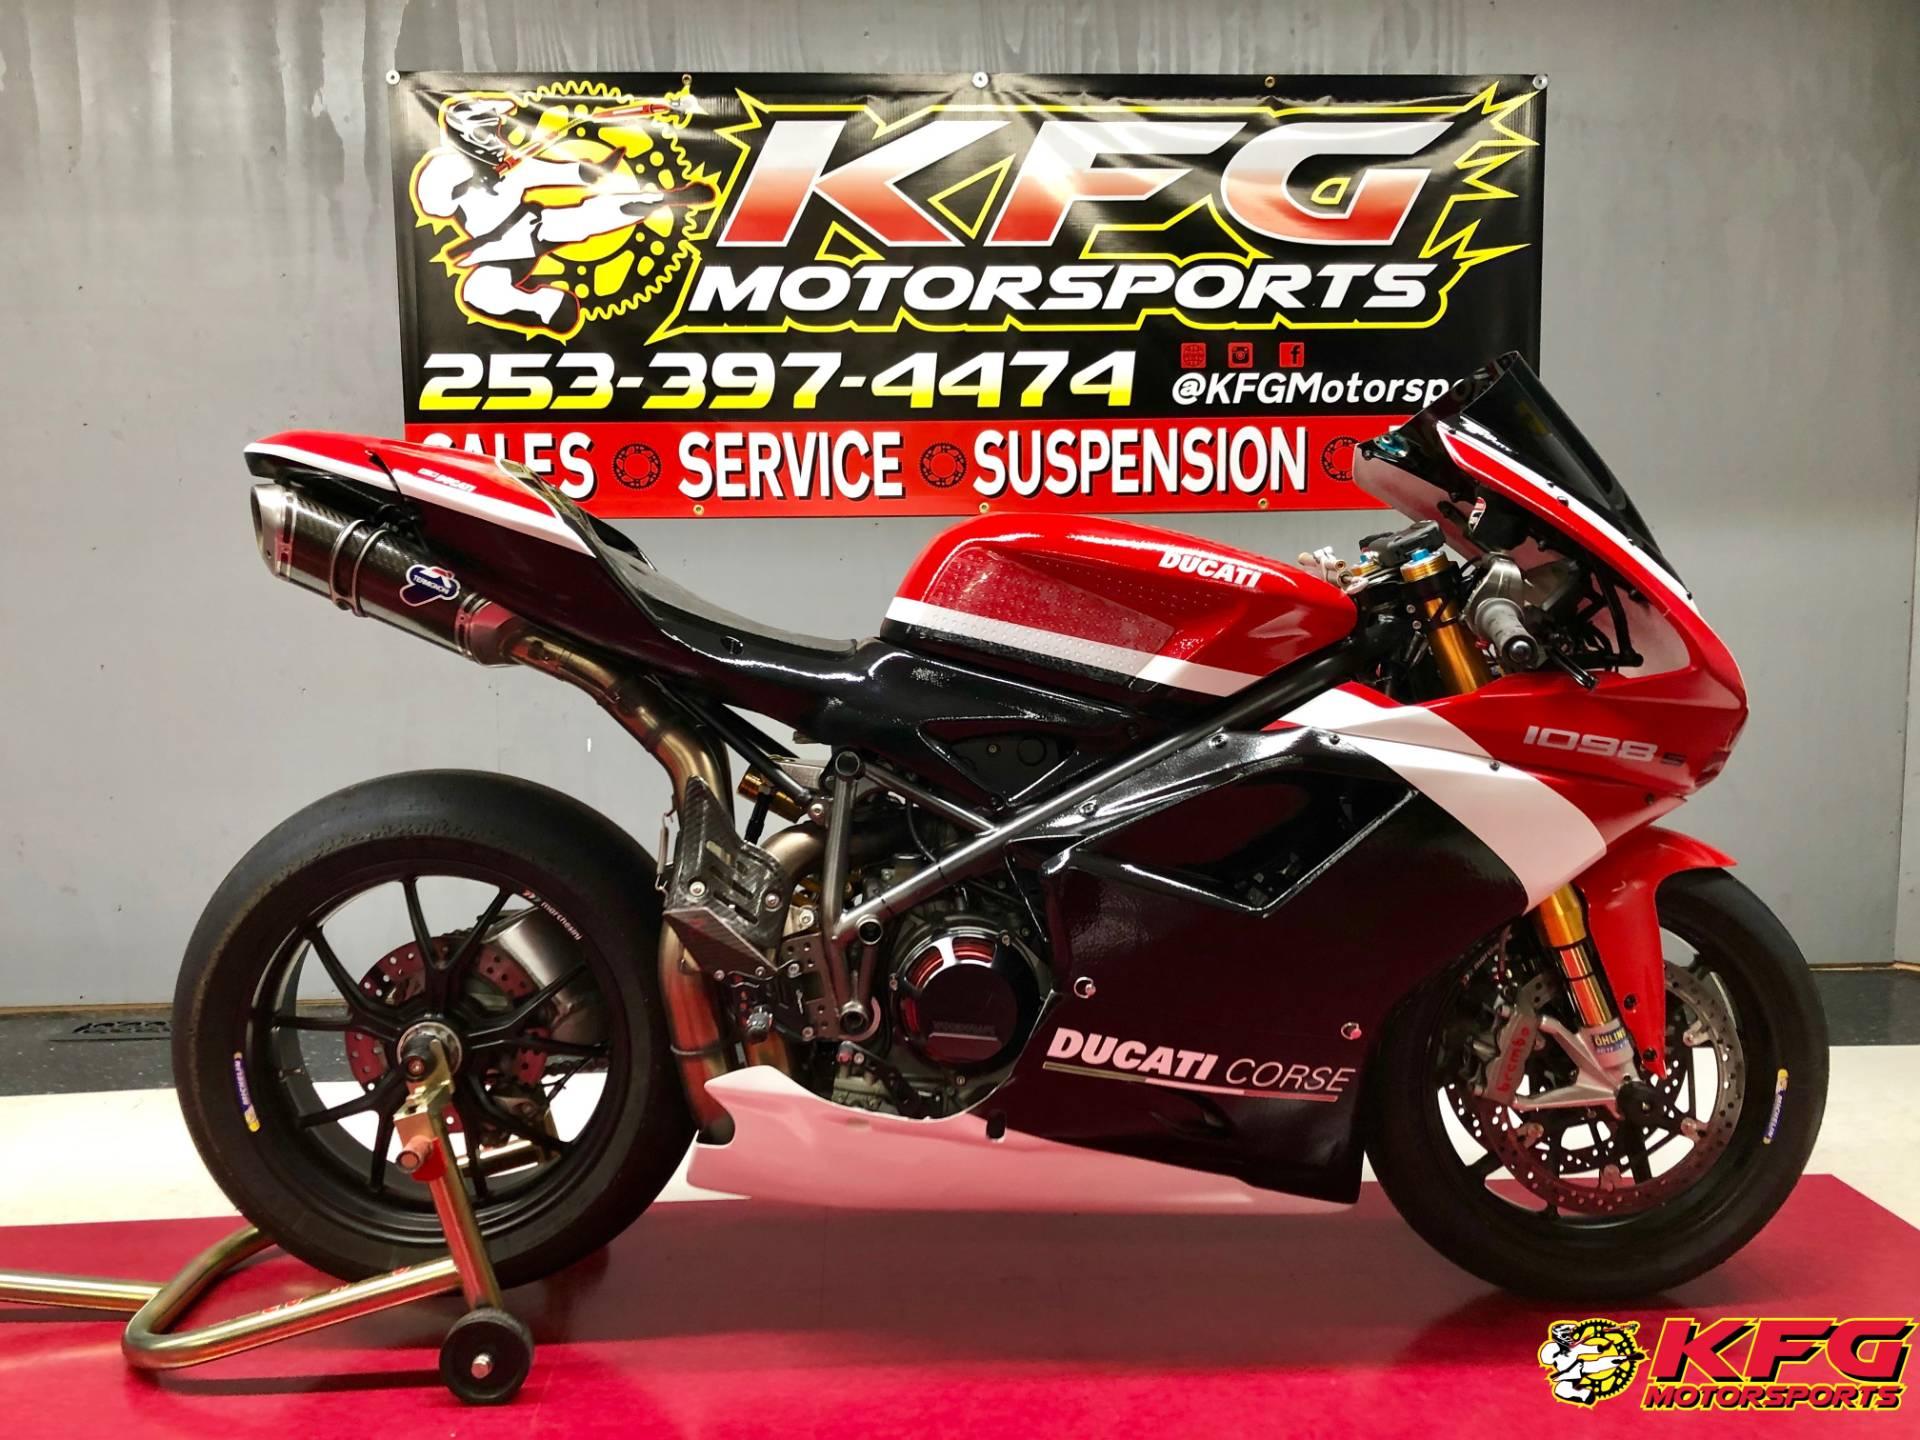 Used 2008 Ducati Superbike 1098 S Motorcycles In Auburn Wa Stock